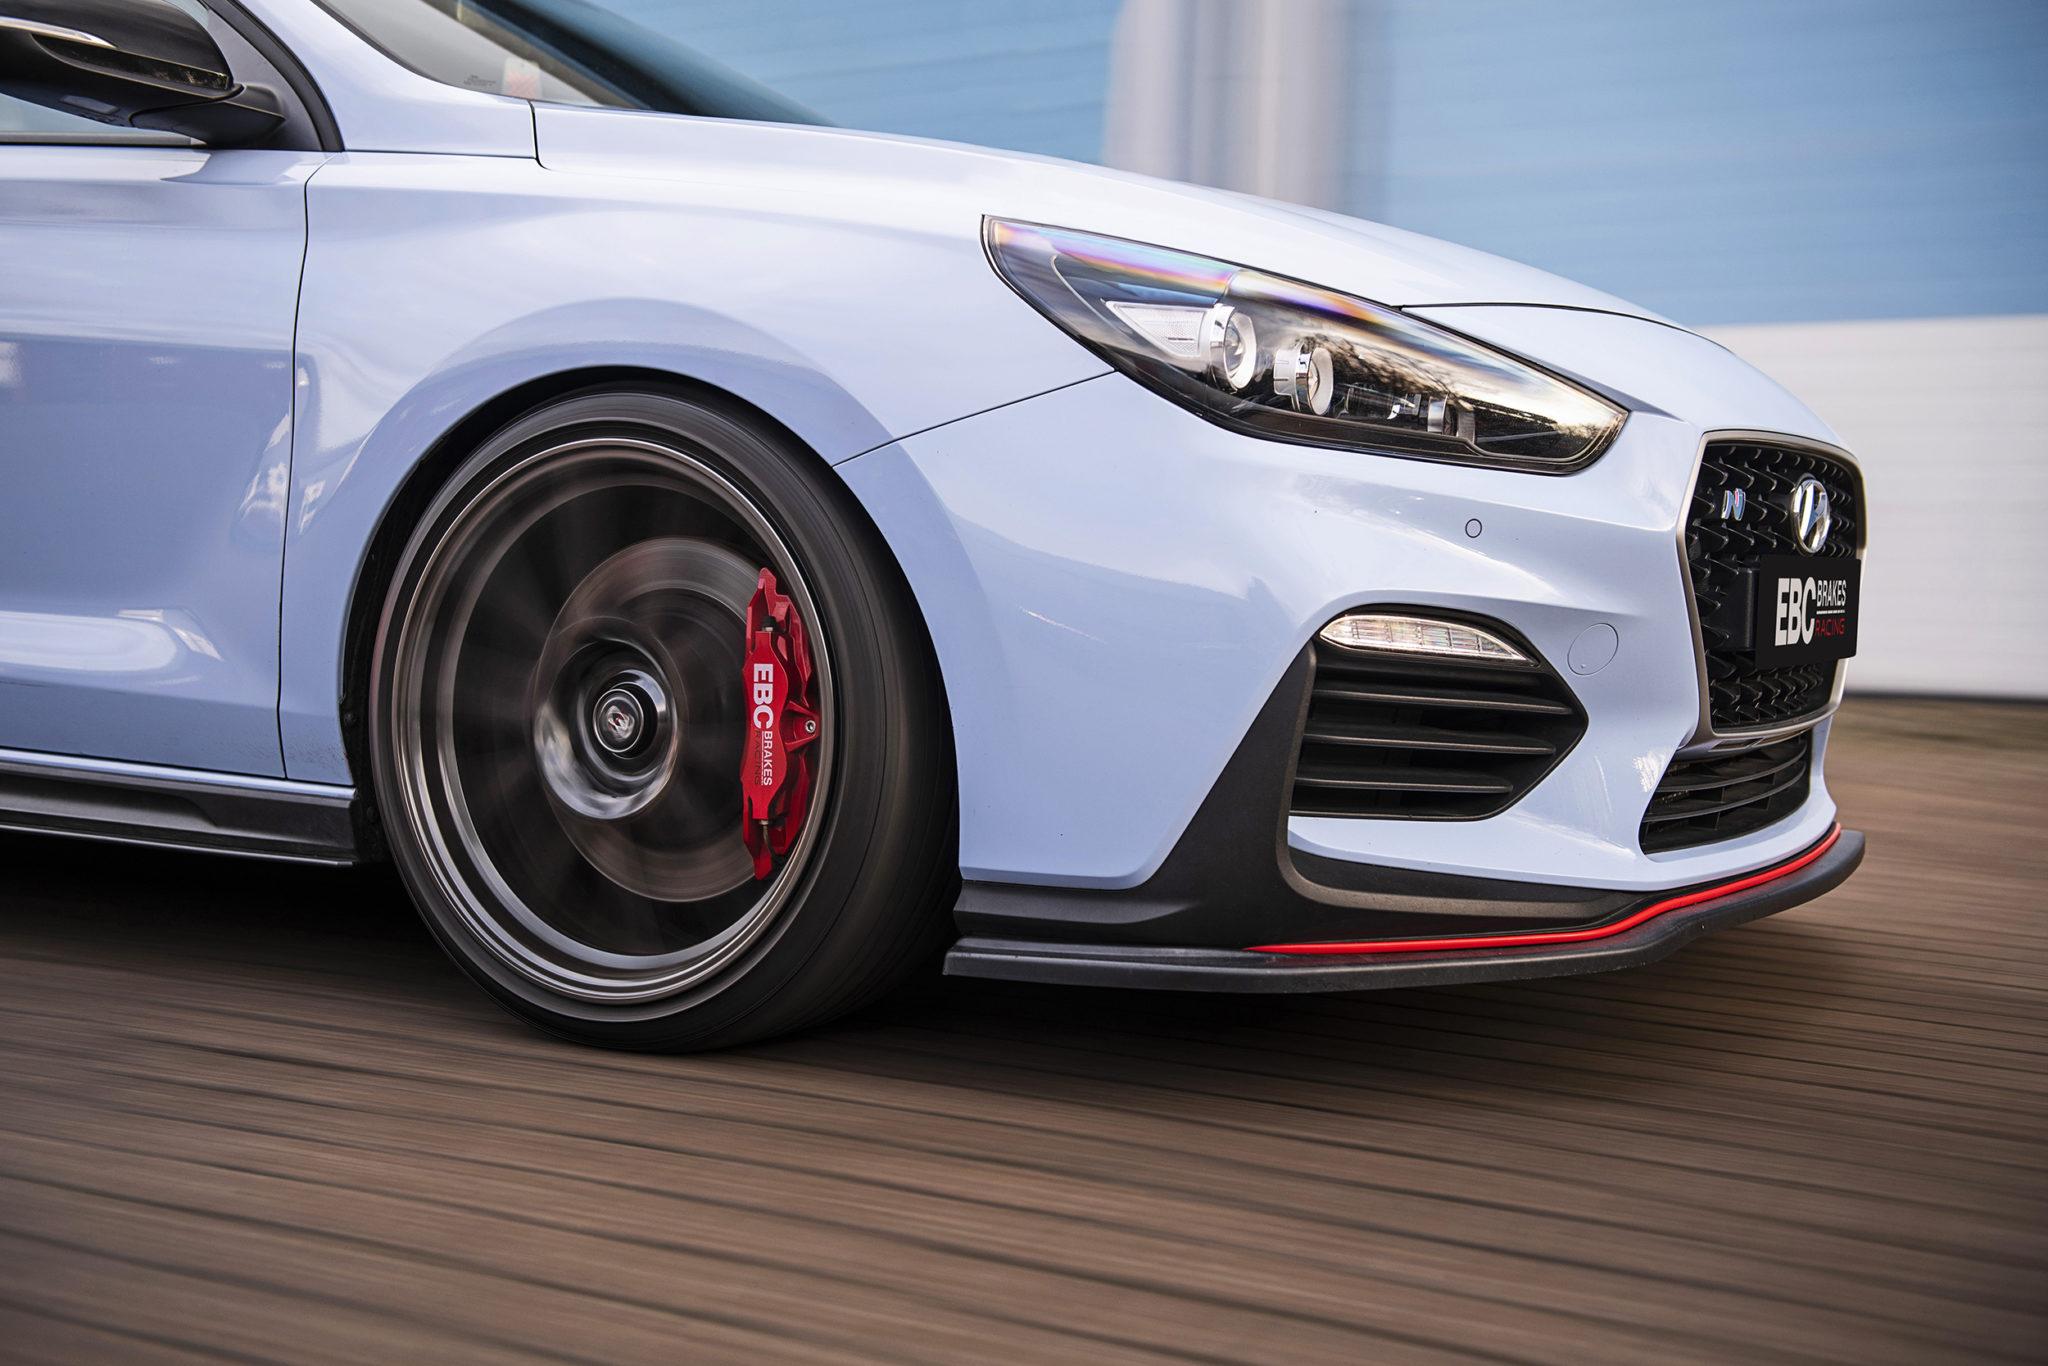 EBC Brakes Racing Apollo Balanced Big Brake Kits Now Available for the Hyundai i30N